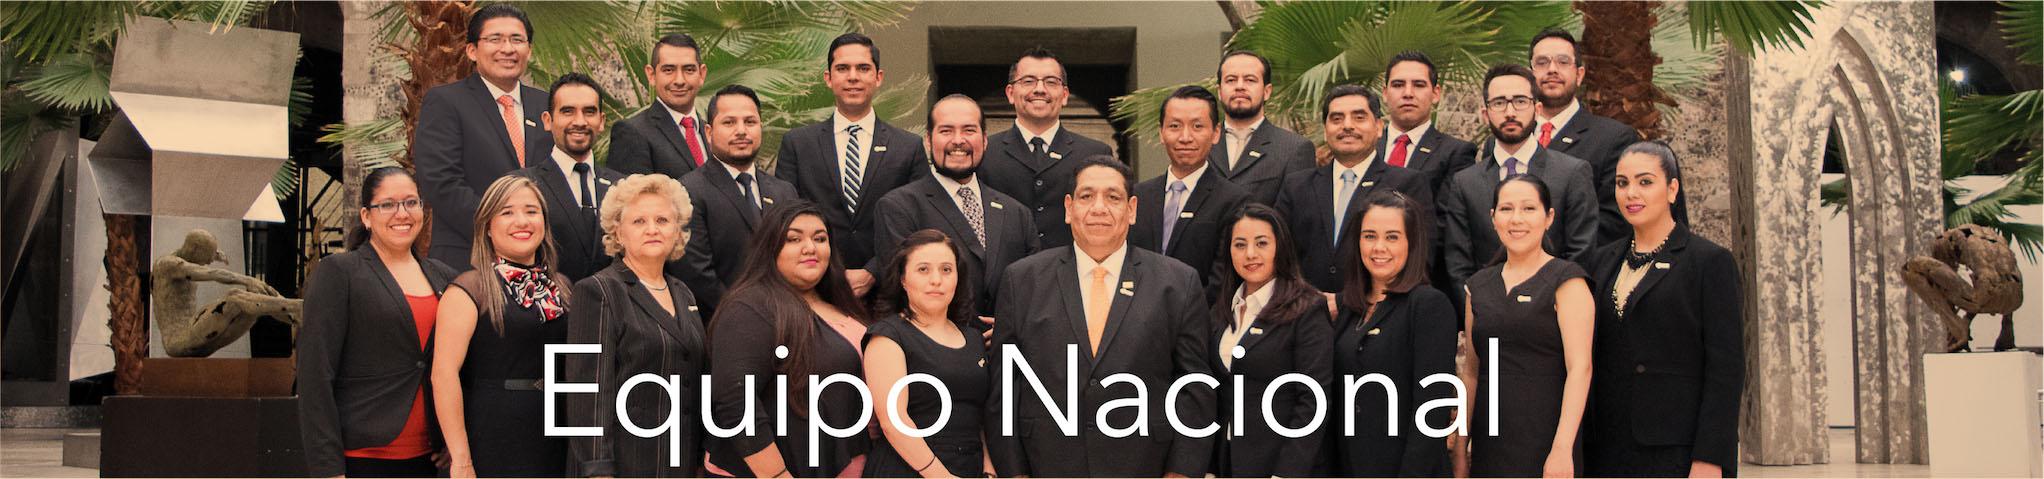 Equipo Nacional